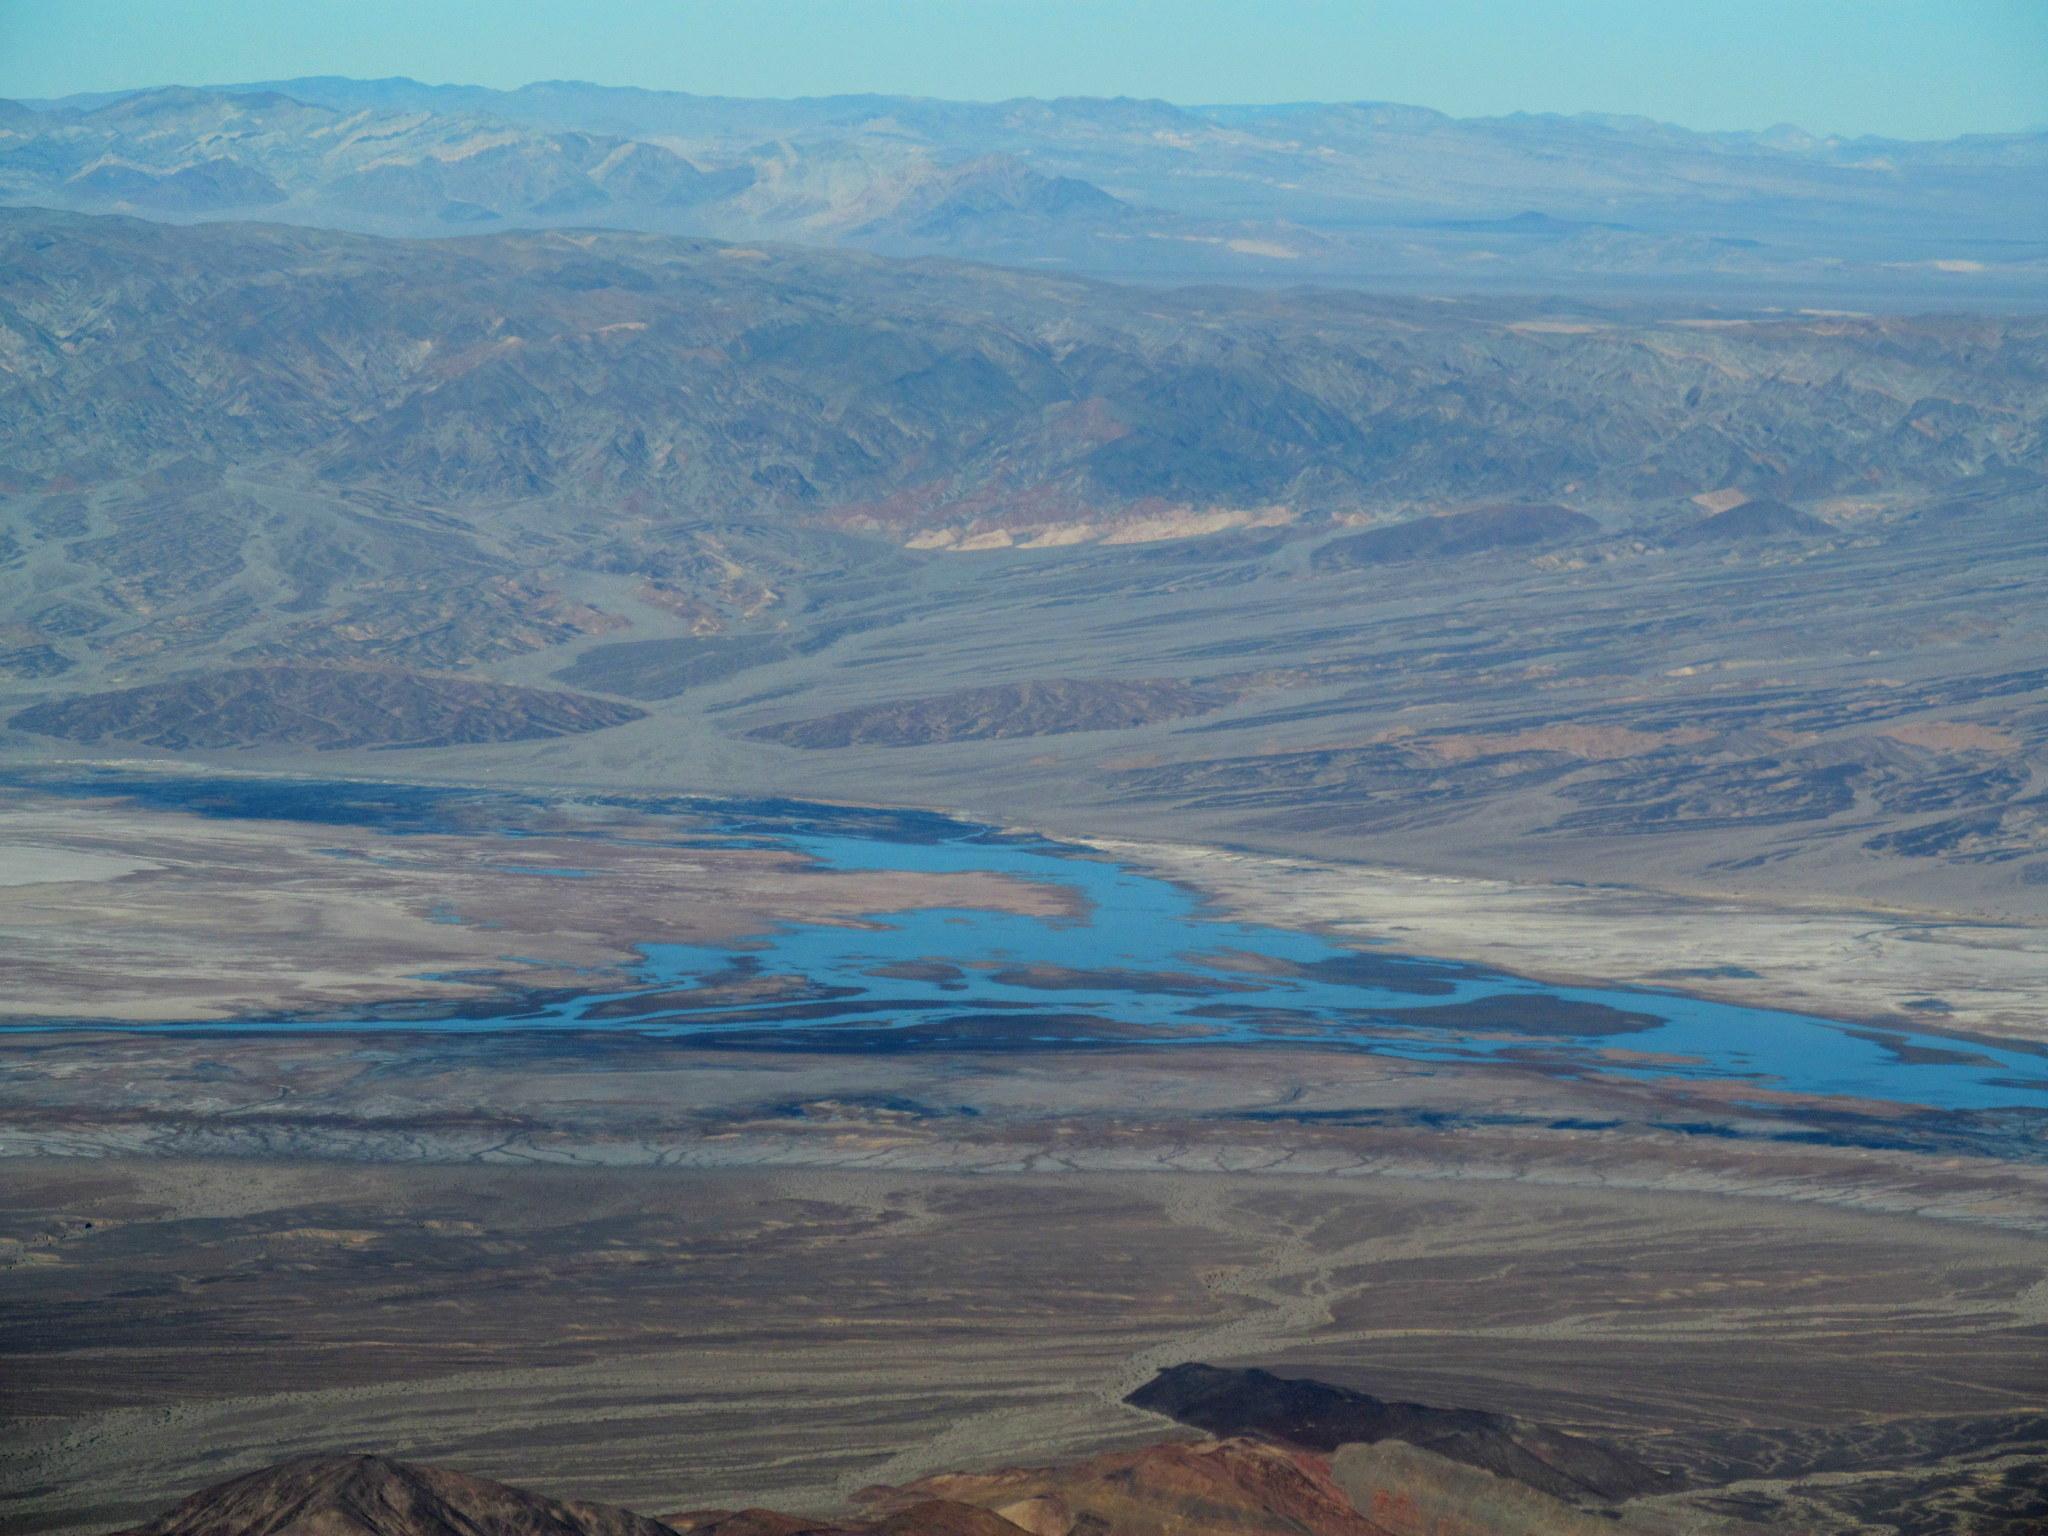 Photo: Cottonball Basin